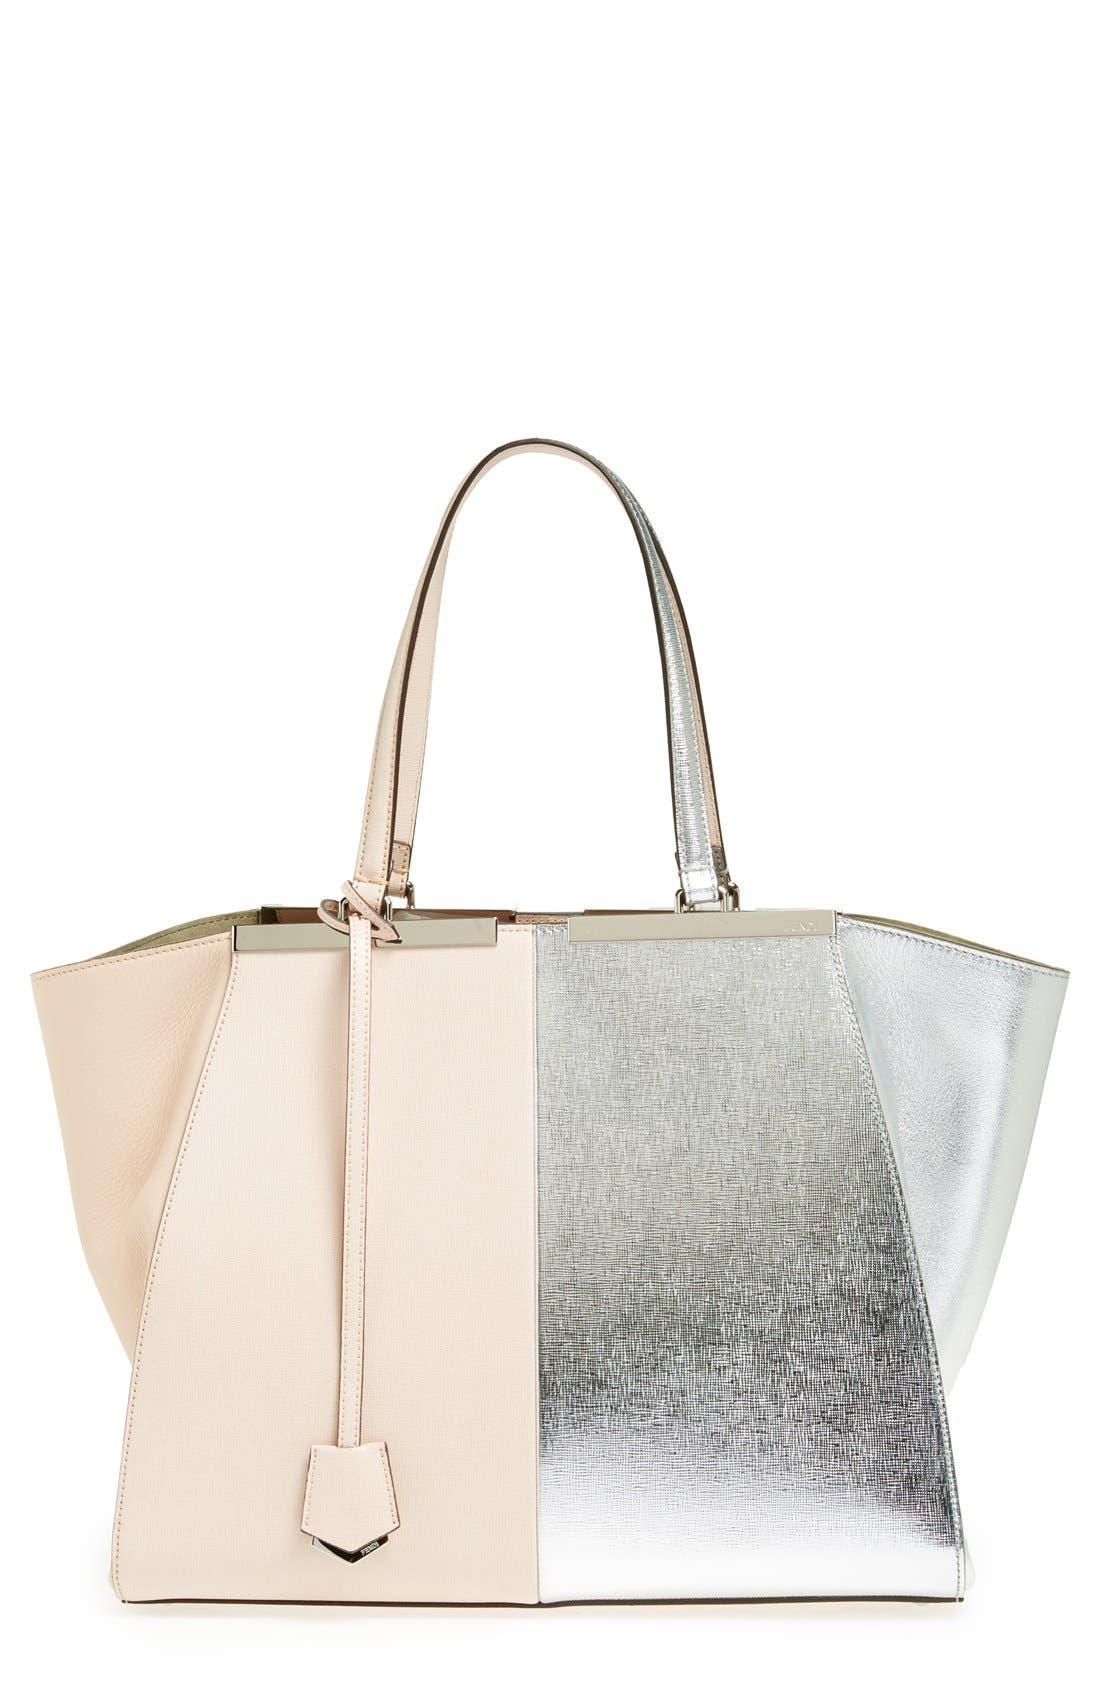 Alternate Image 1 Selected - Fendi '3Jours' Bicolor Leather Shopper